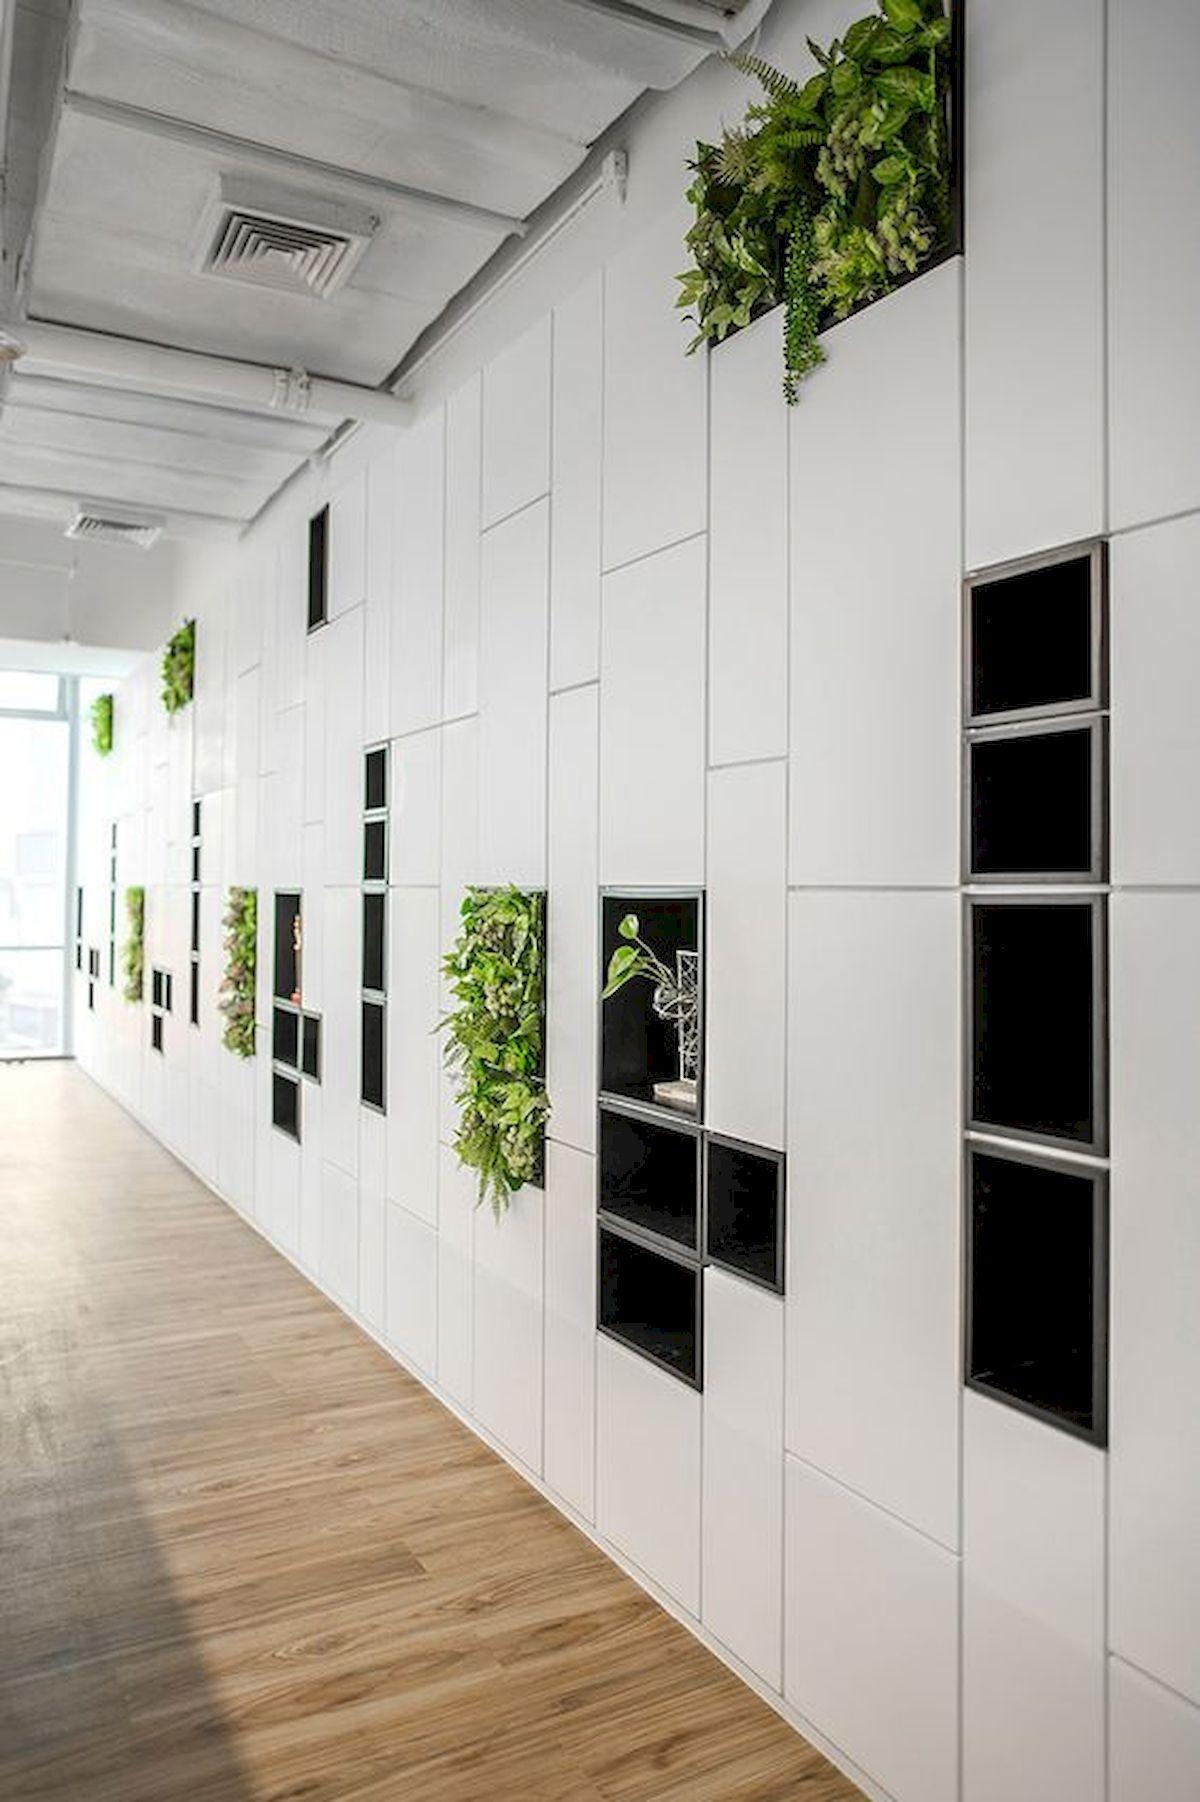 Indoor Garden Office and Office Plants Design Ideas For Summer